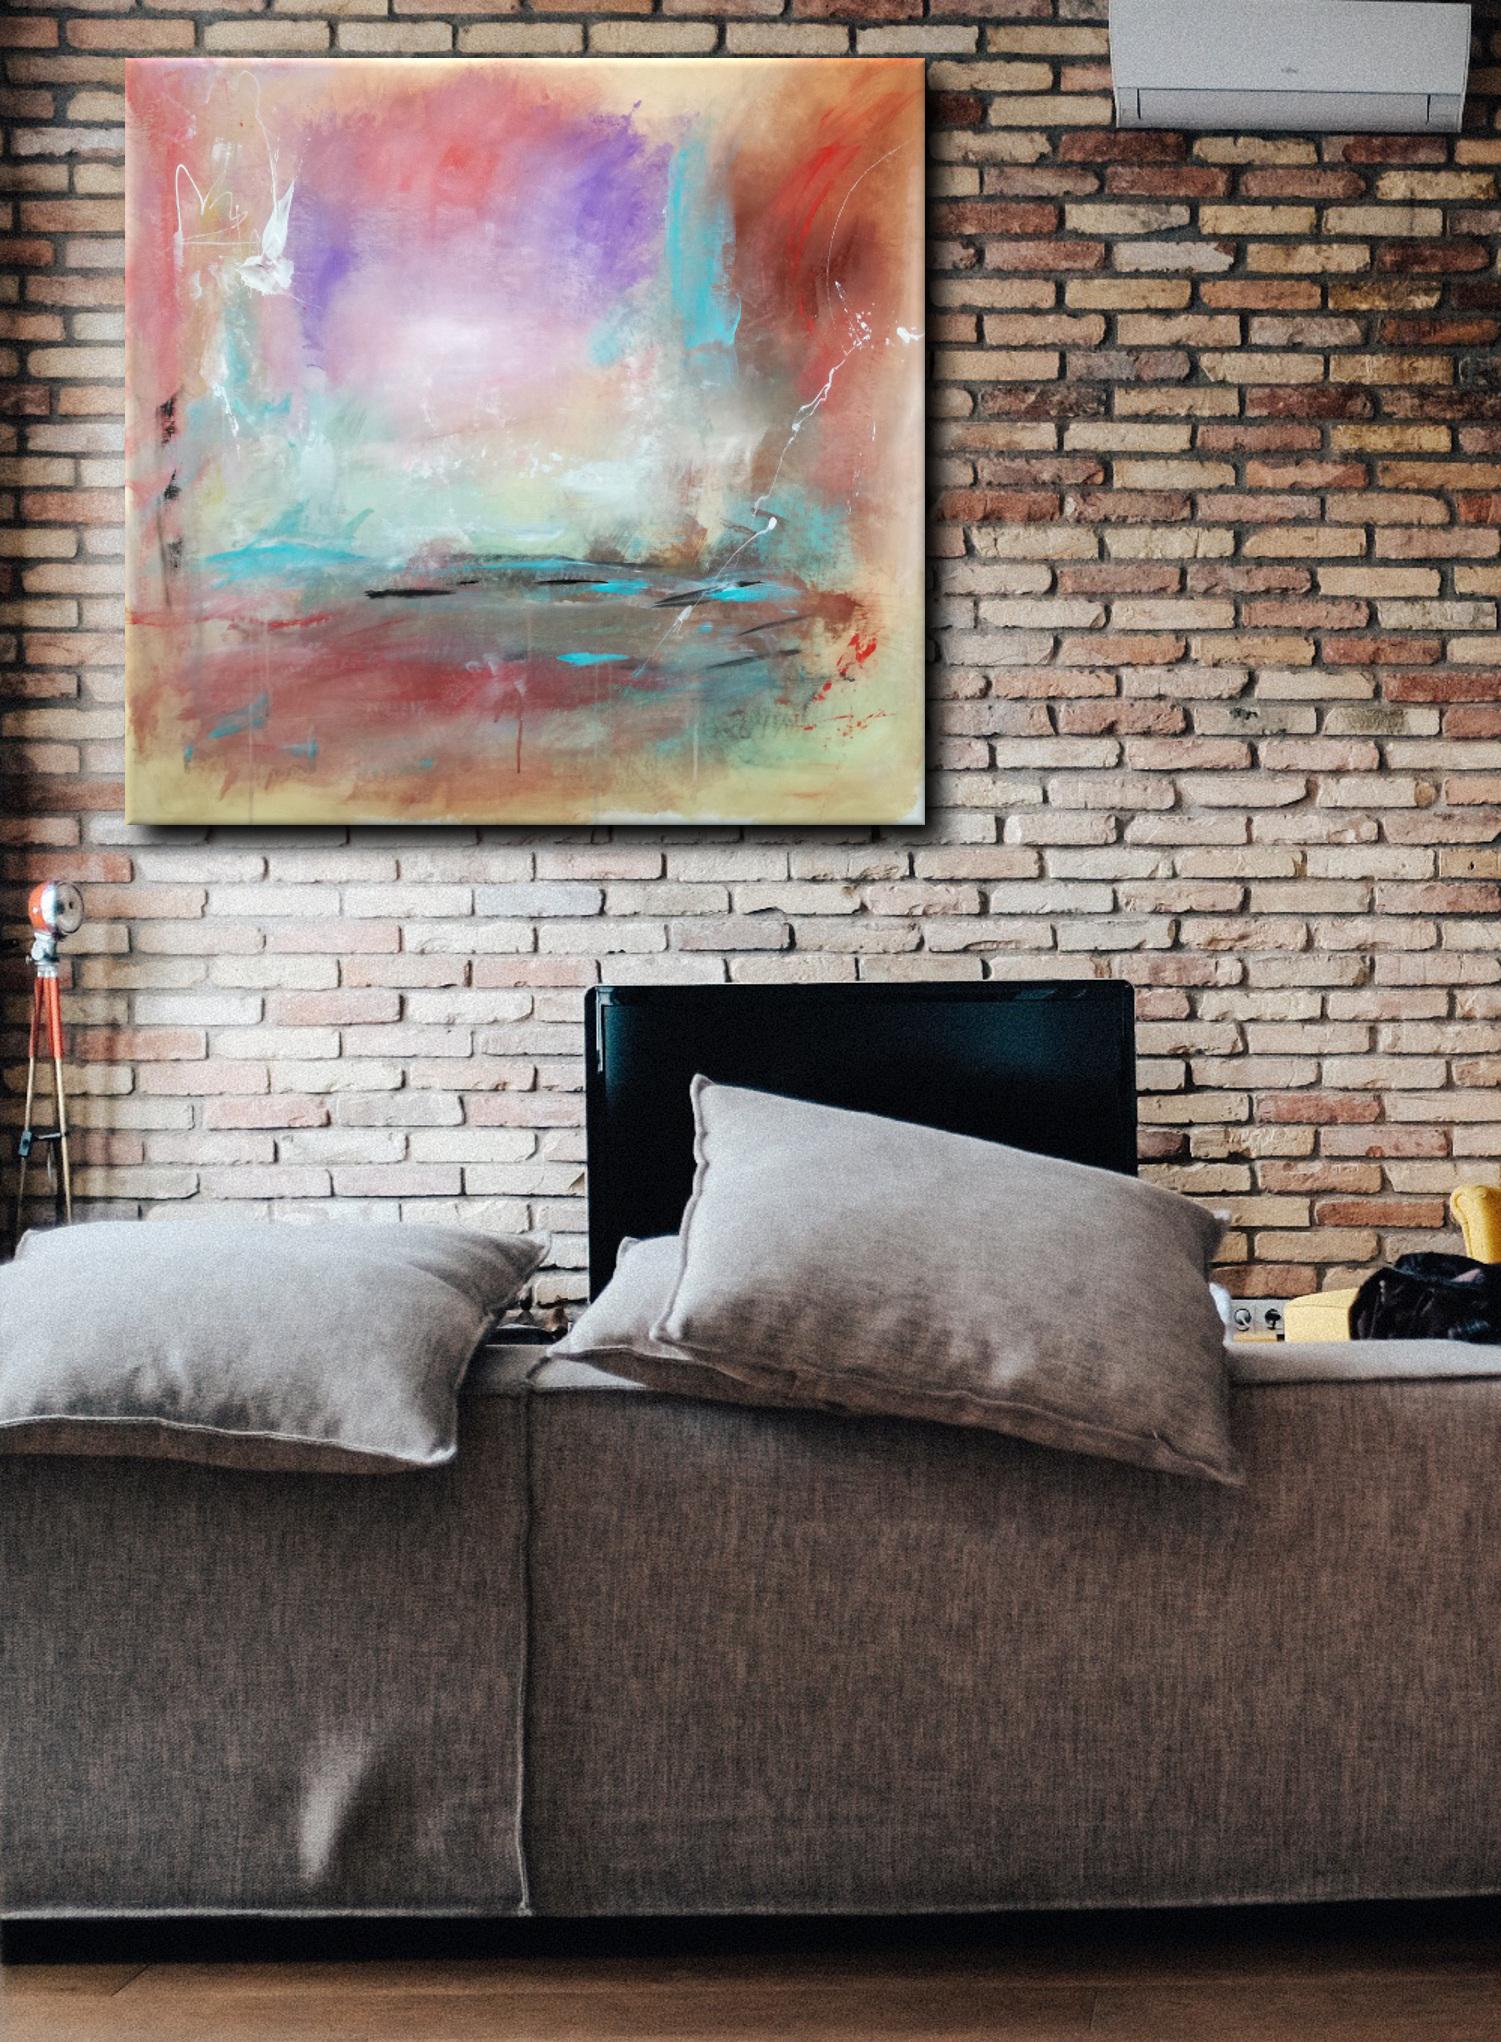 paesaggio astratto dipinto su tela a mano 100x100 | sauro bos